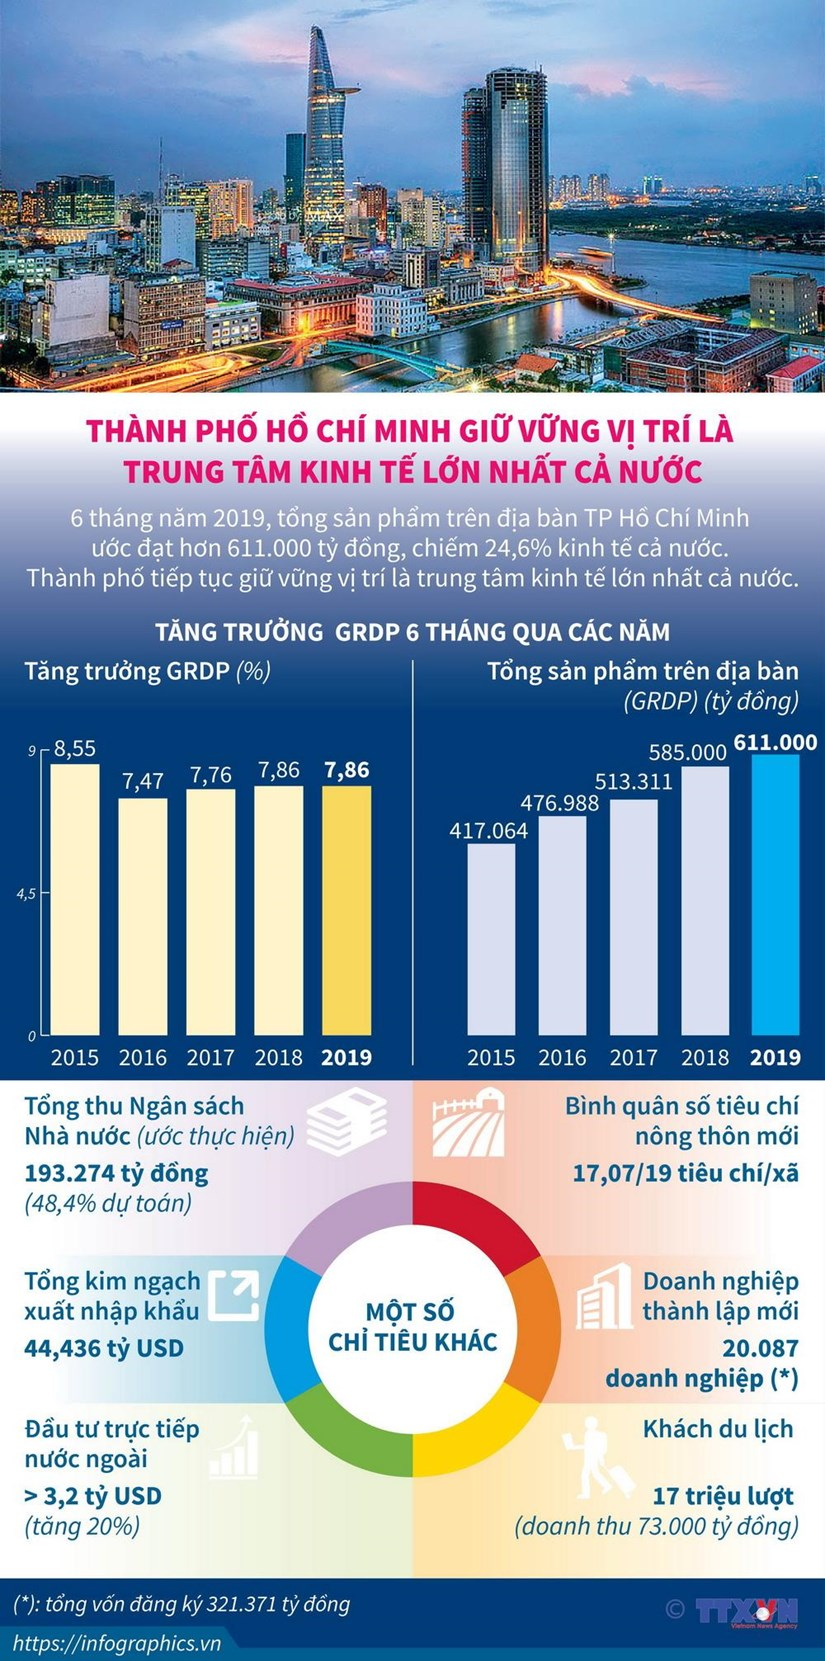 [Infographics] TP.HCM van la trung tam kinh te lon nhat ca nuoc hinh anh 1